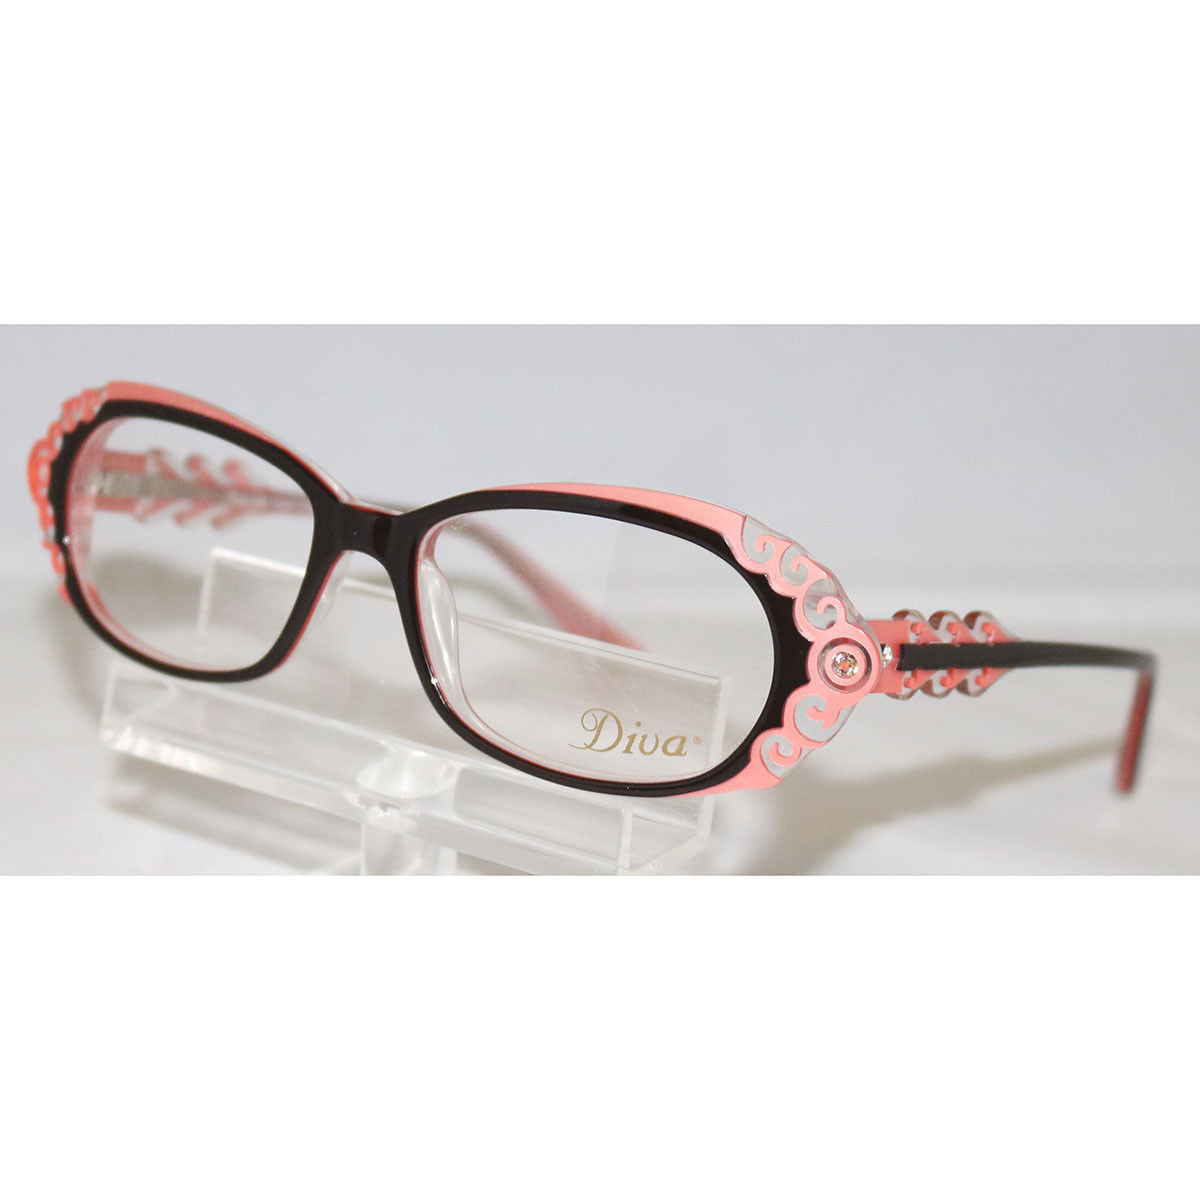 ff8e10ce426 Diva Women s Eyeglasses 5398 746 Black   and 50 similar items